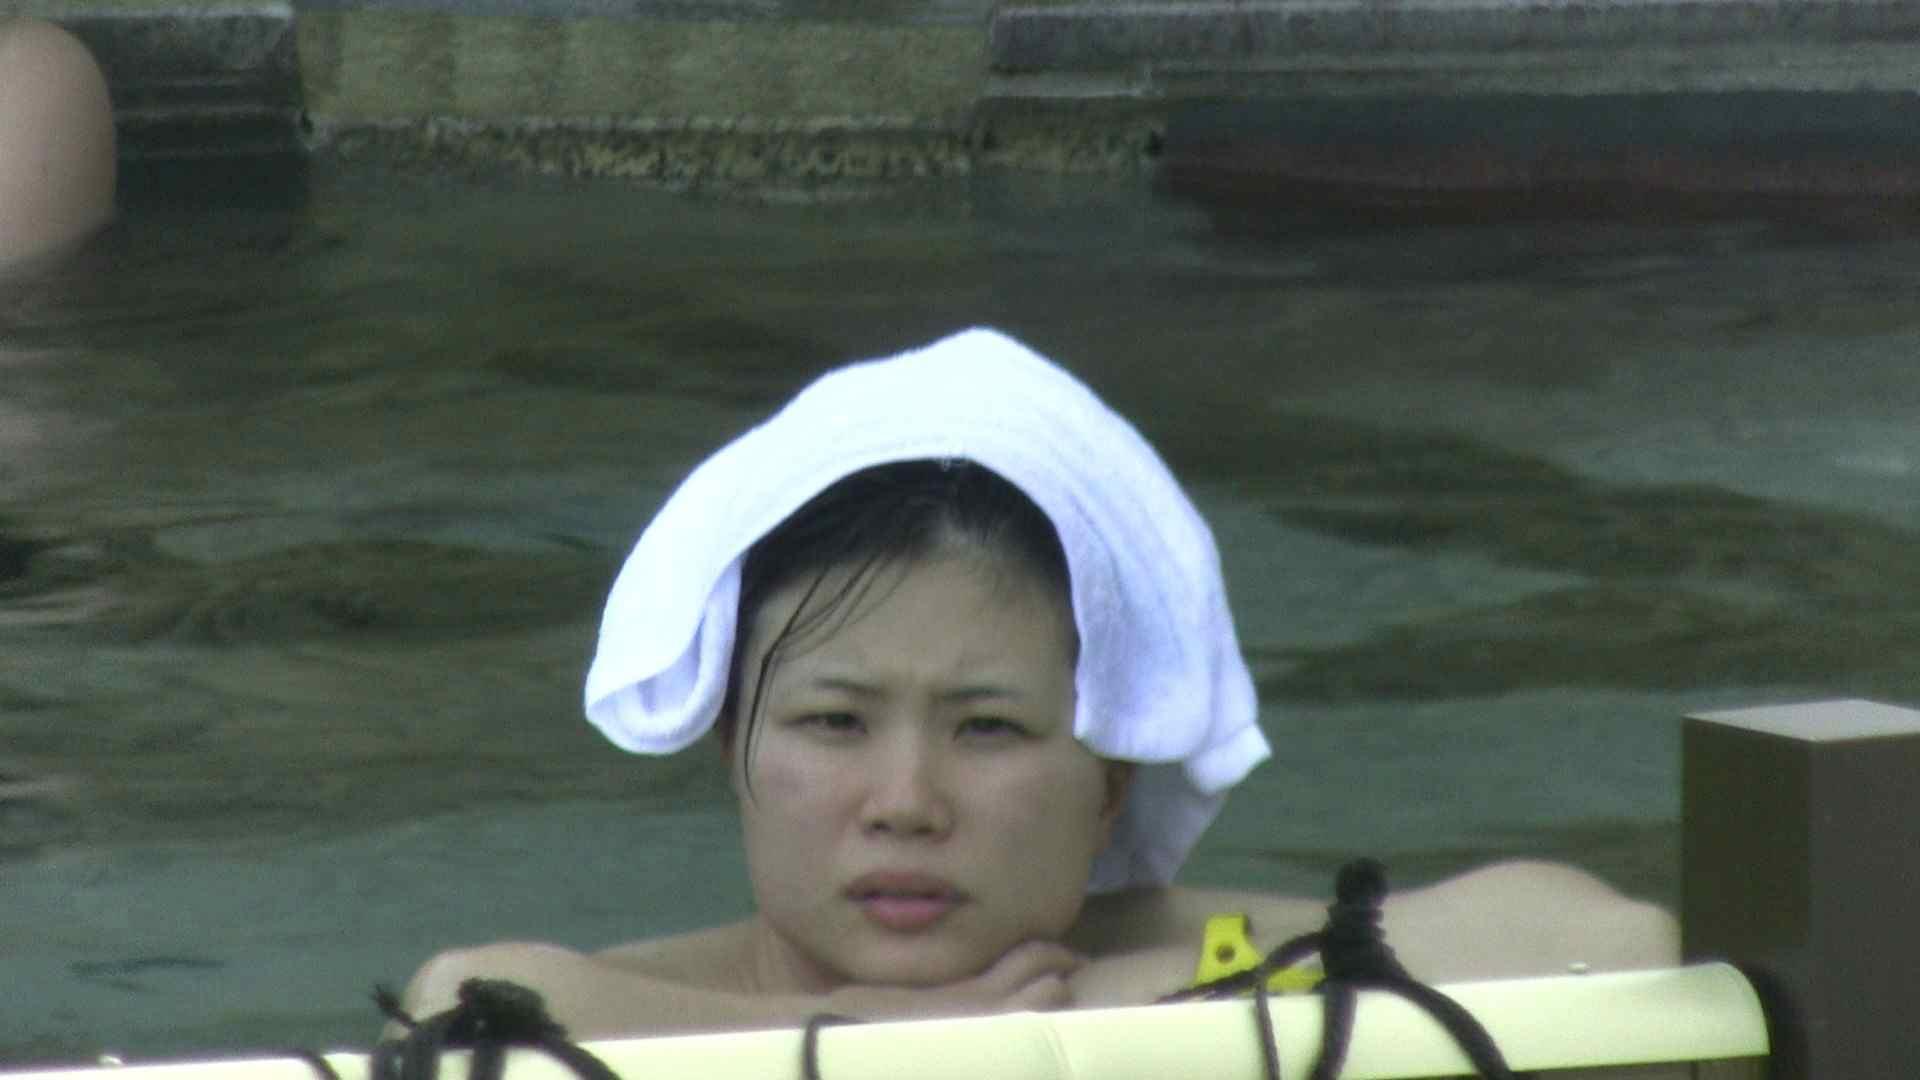 Aquaな露天風呂Vol.183 露天 濡れ場動画紹介 106pic 39